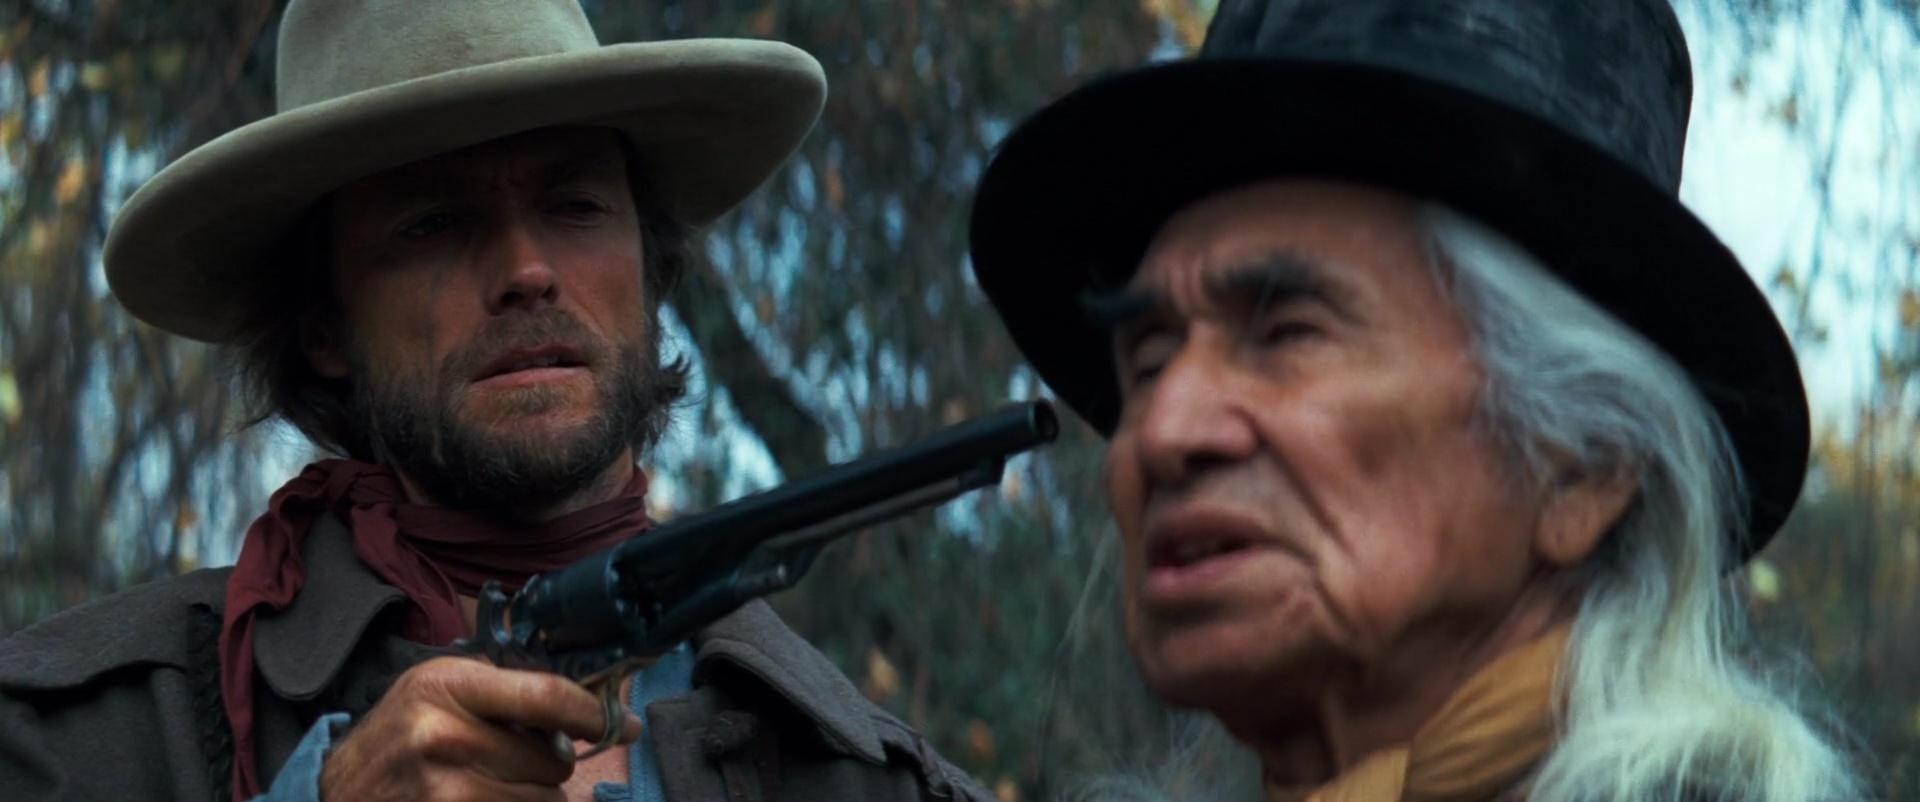 JOSEY WALES HORS-LA-LOI (The Outlaw Josey Wales) de Clint Eastwood (1976)